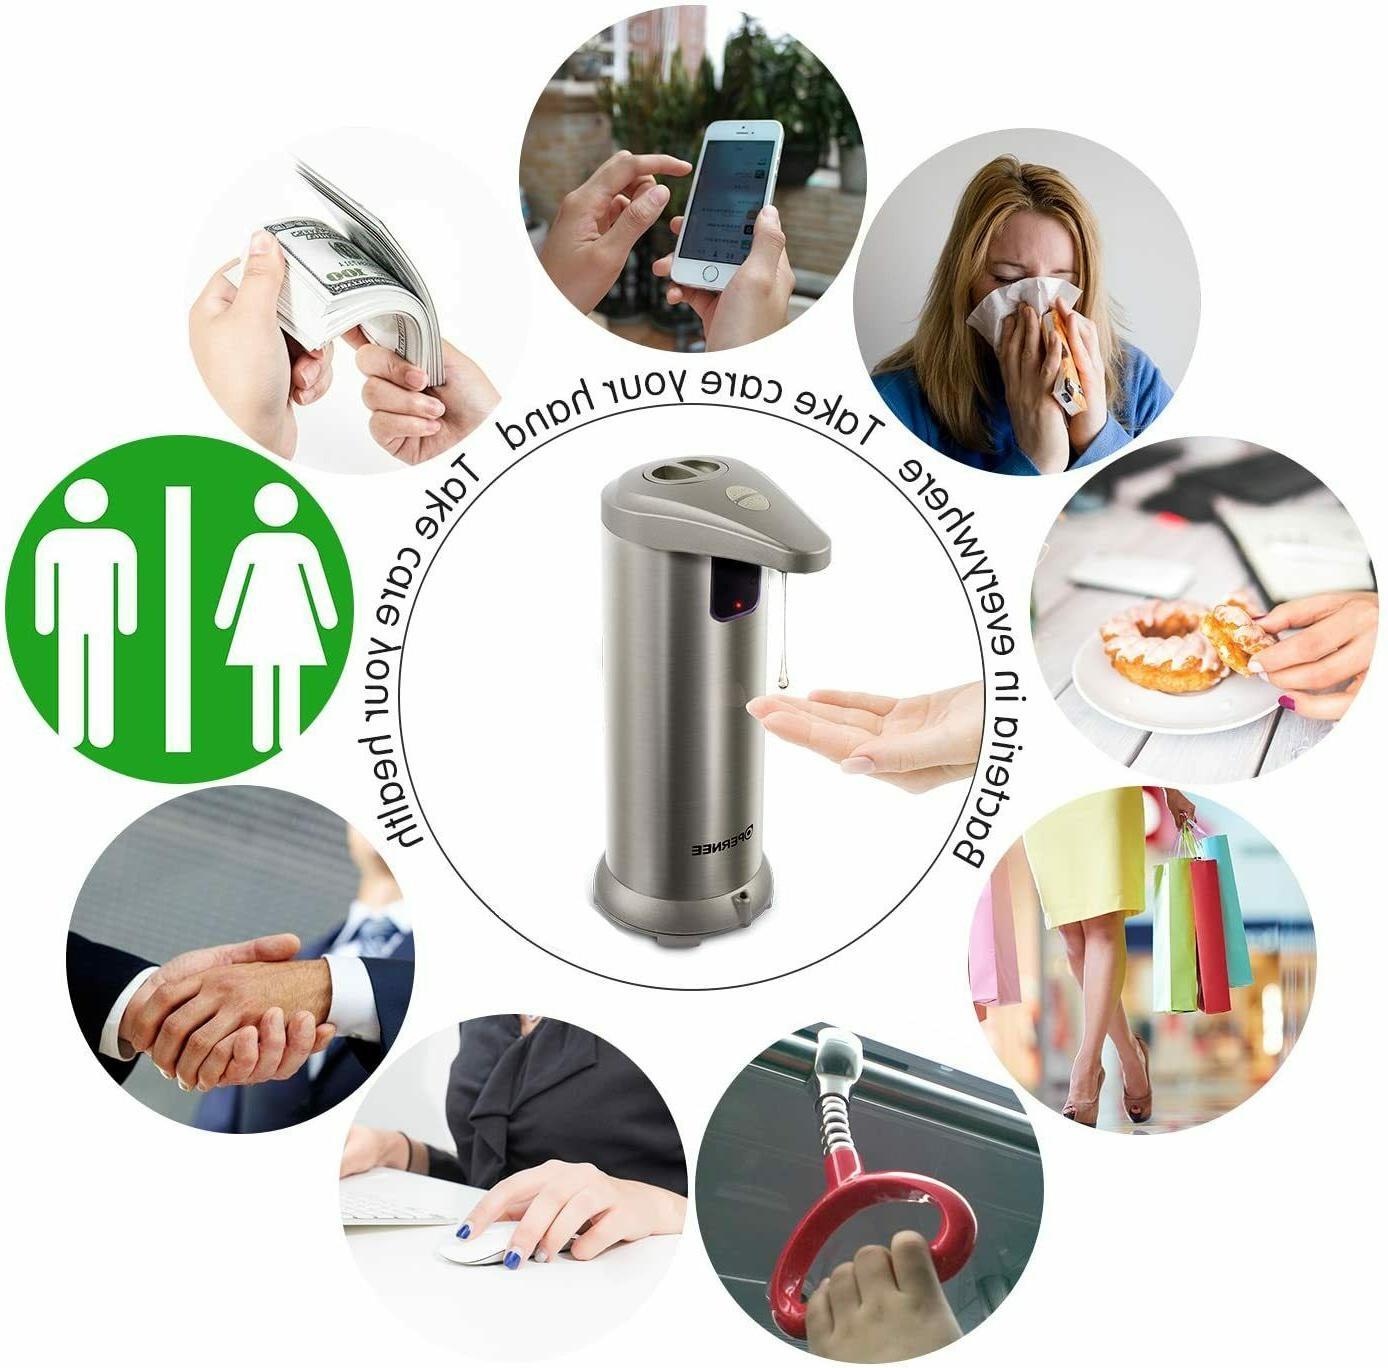 Soap dispenser, Touchless Stainless Steel Resistan